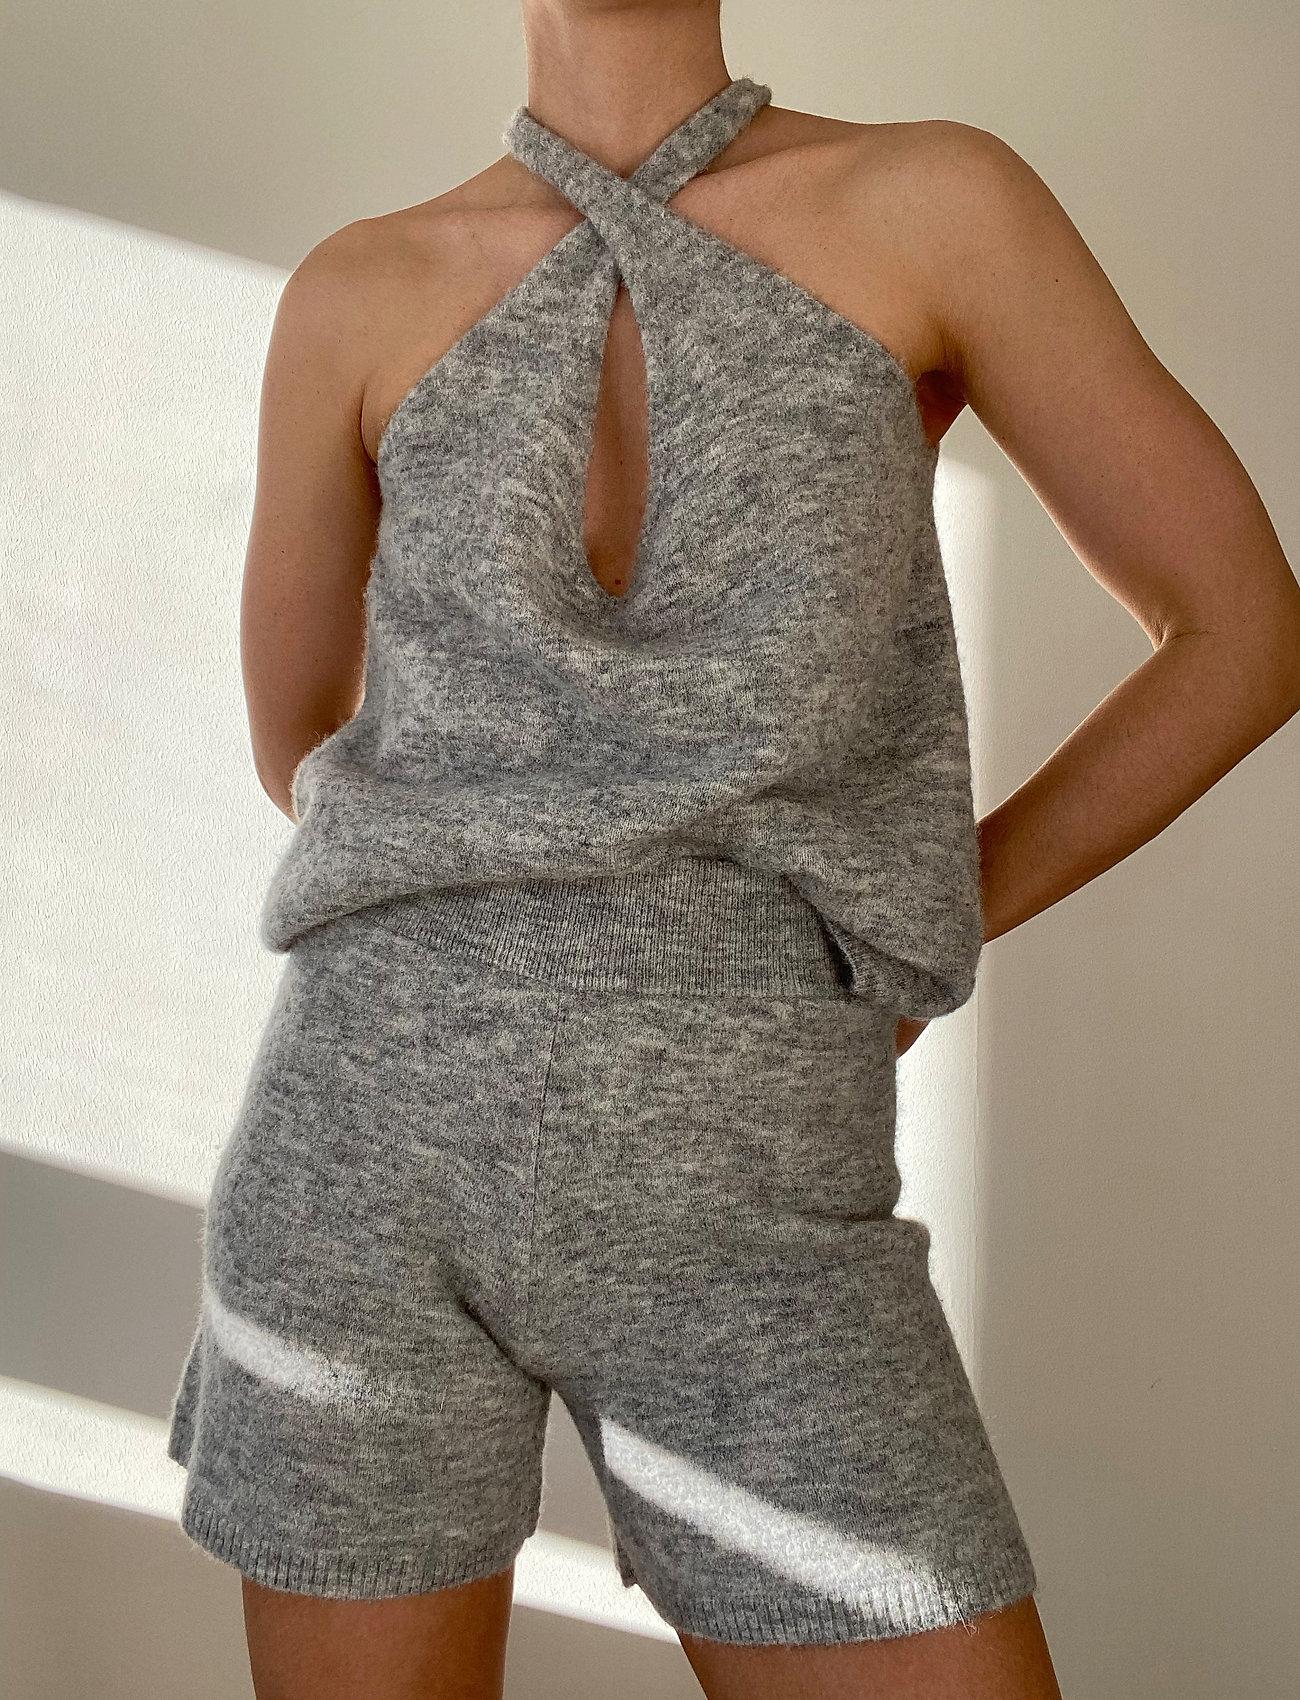 Stylein - ETOILE TOP - tops zonder mouwen - light grey - 4